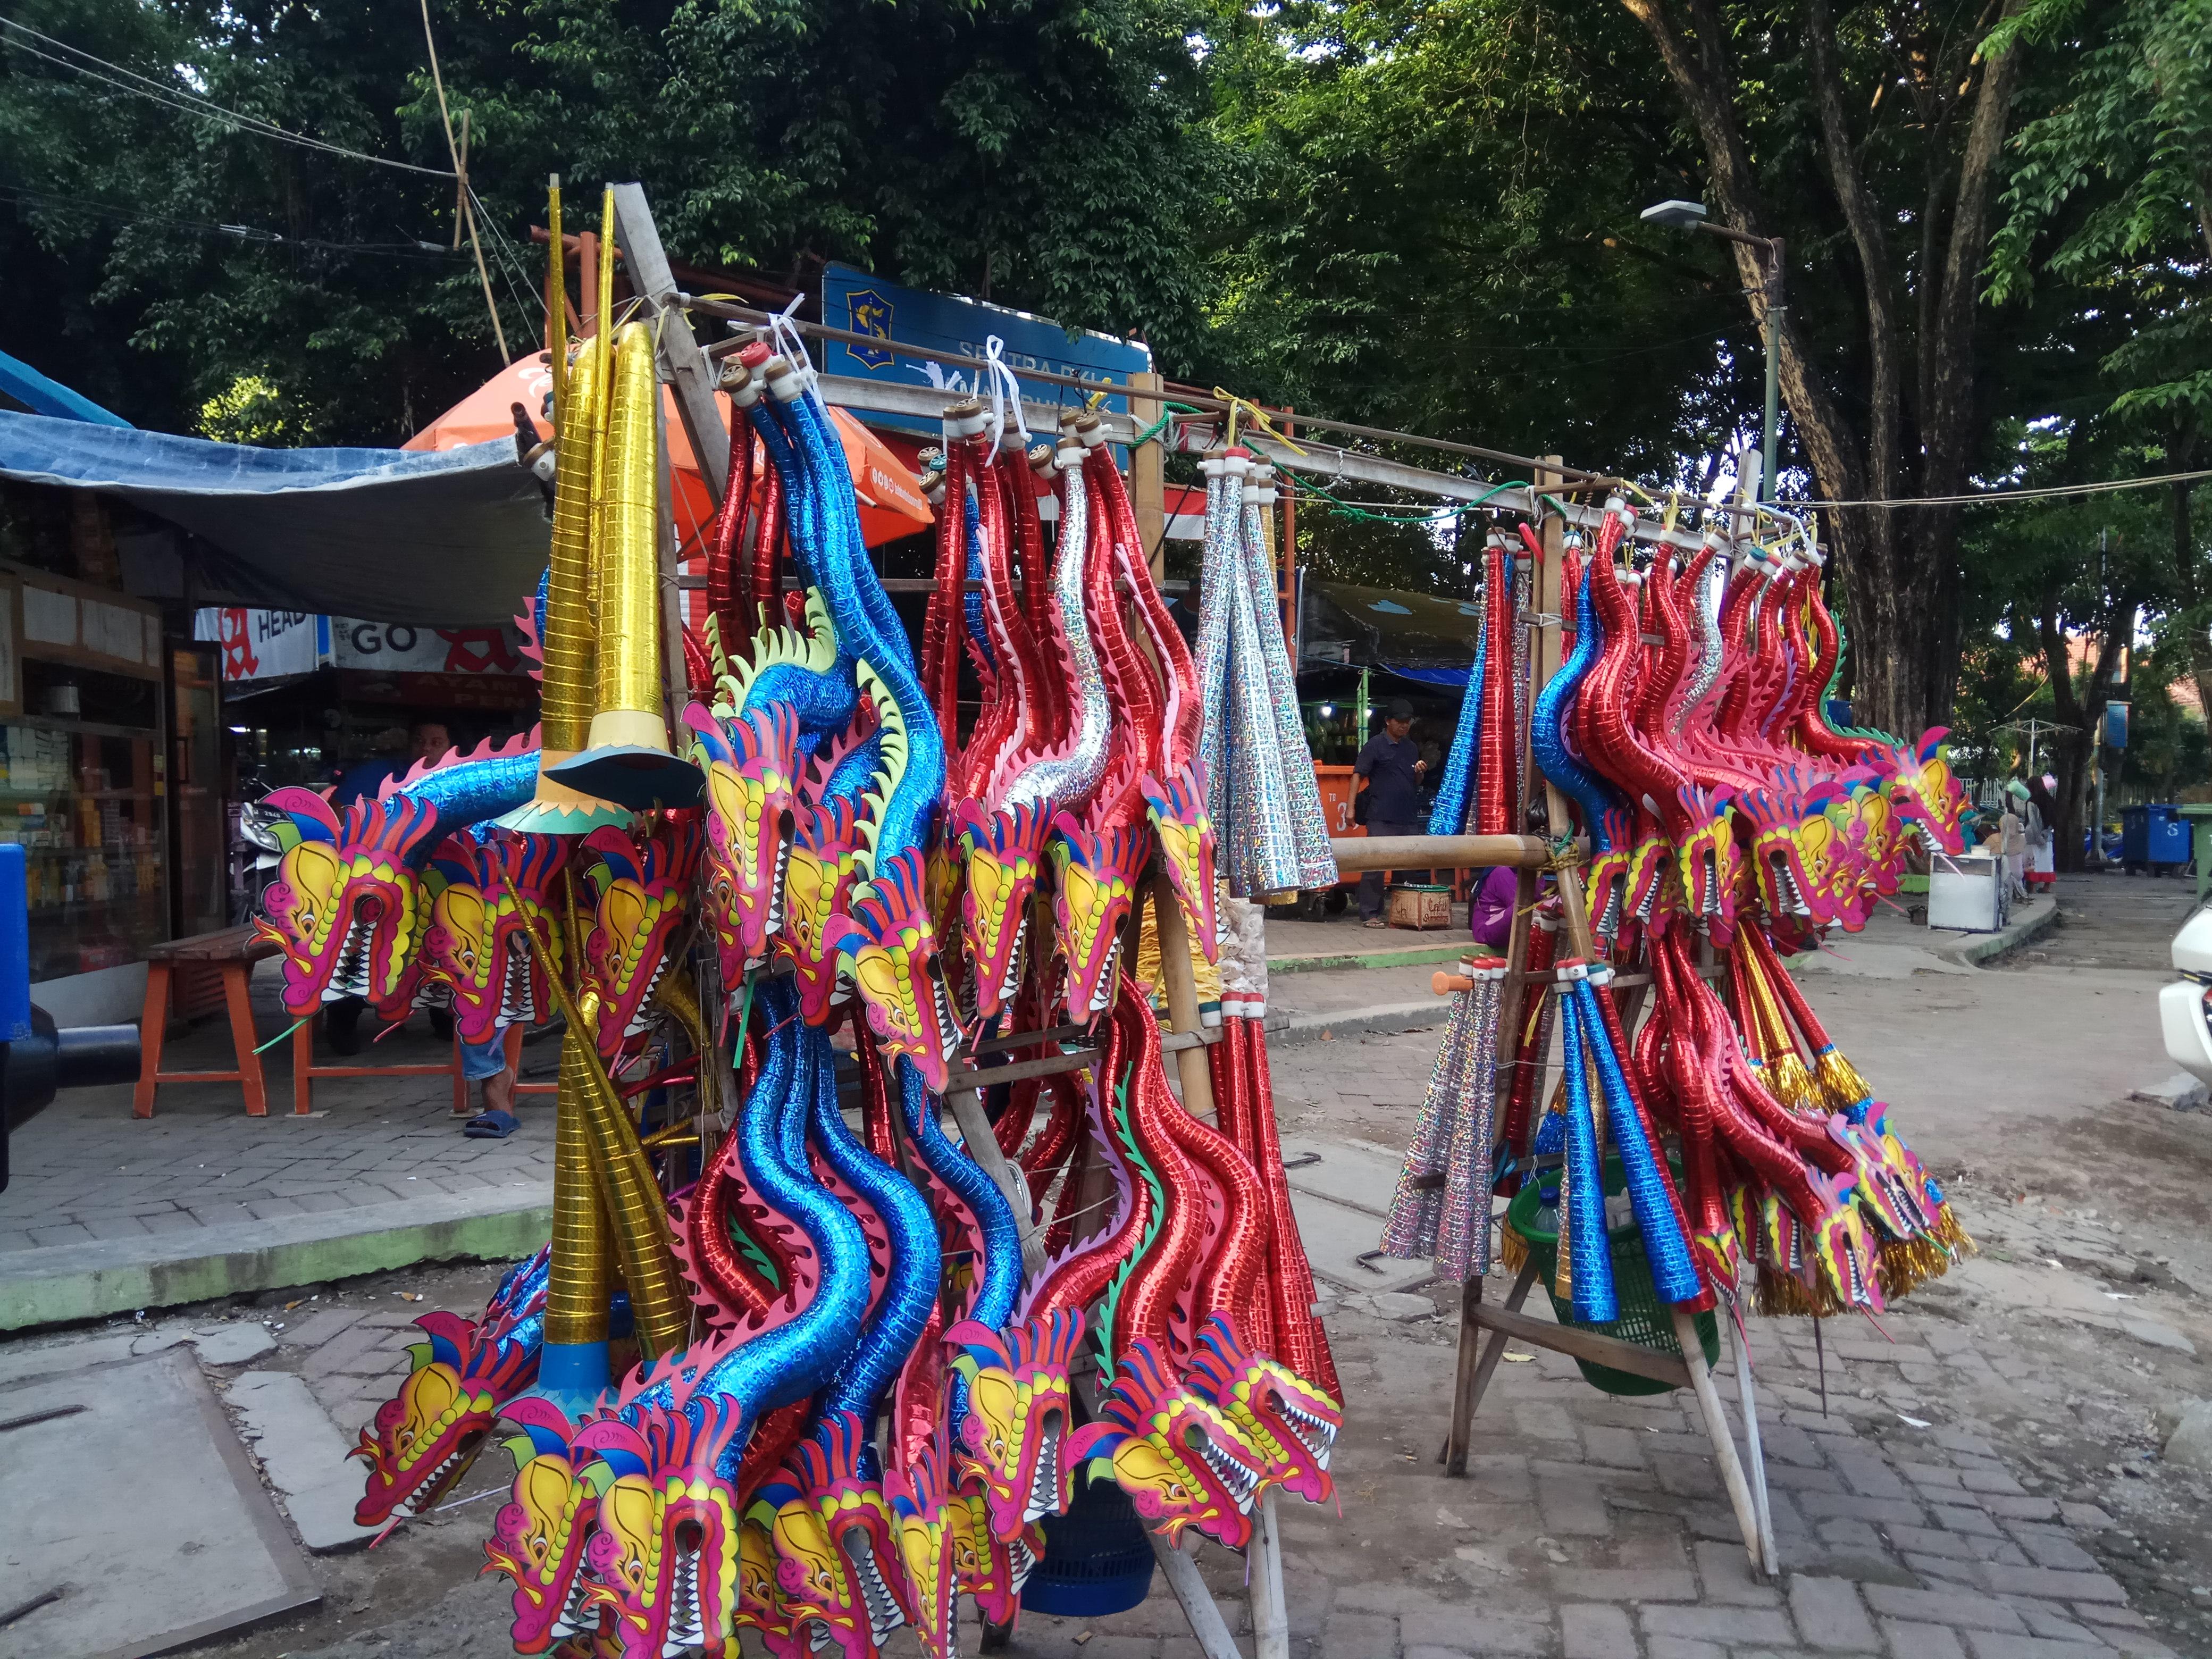 Para penjual terompet di sekitar jalan bungkul | Nurul Arifin / GNFI